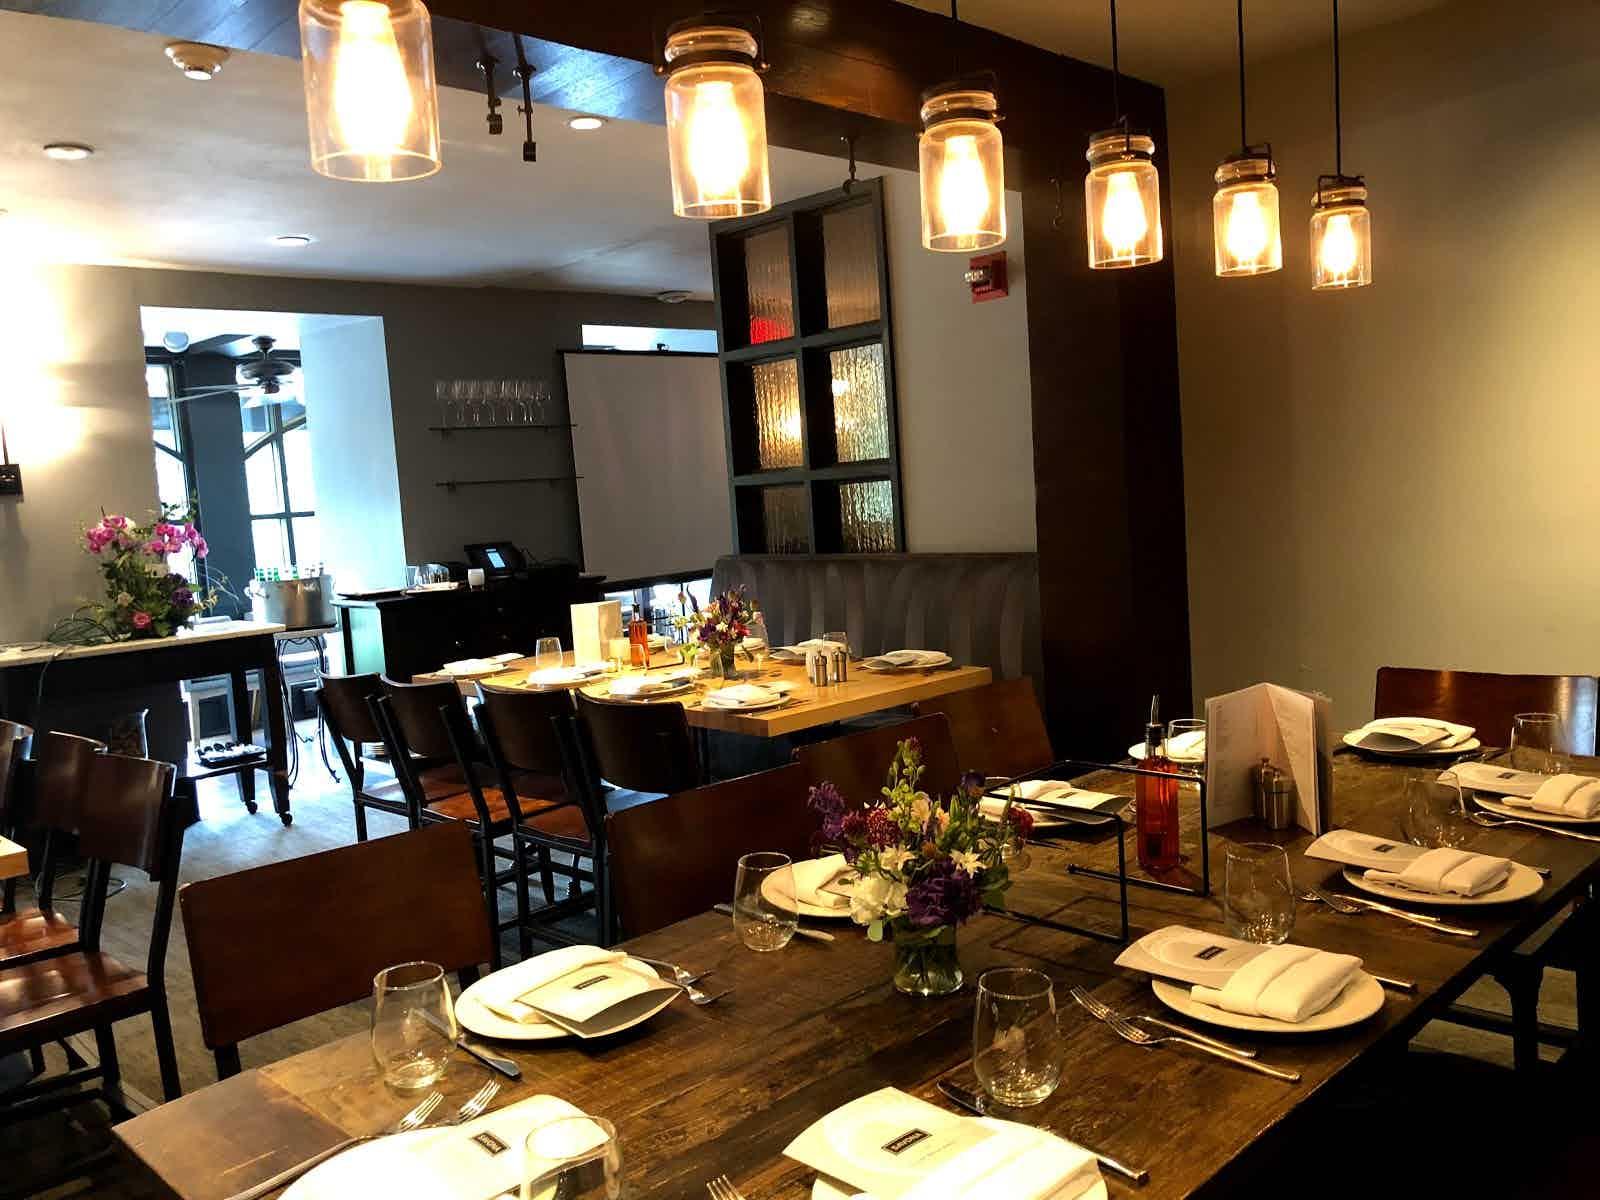 Savona Restaurant Gulph Mills Restaurant Review Zagat